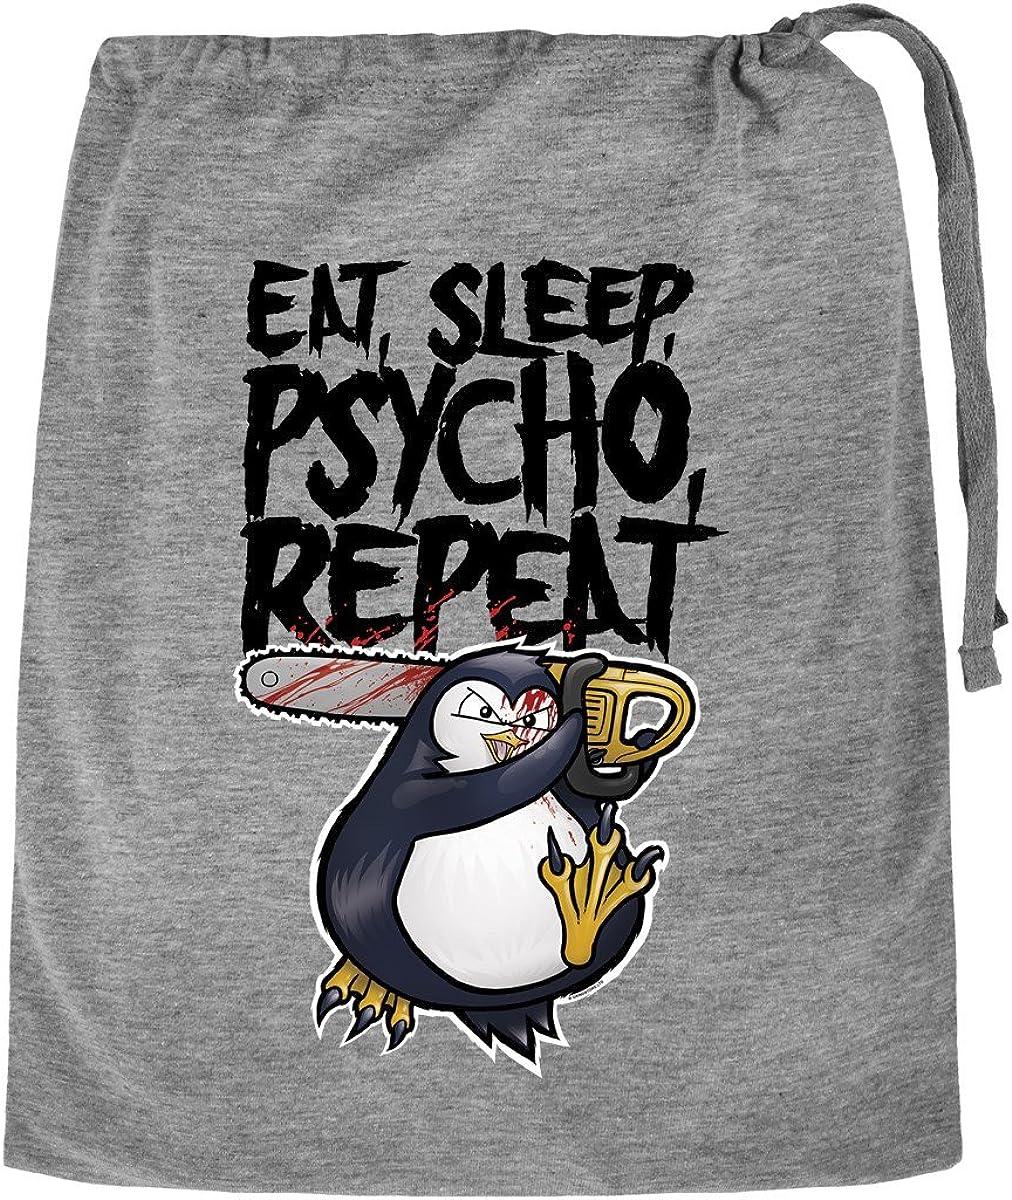 Psycho Sleep Psycho Penguin Pyjama Set Eat Repeat Short In Bag Women/'s White